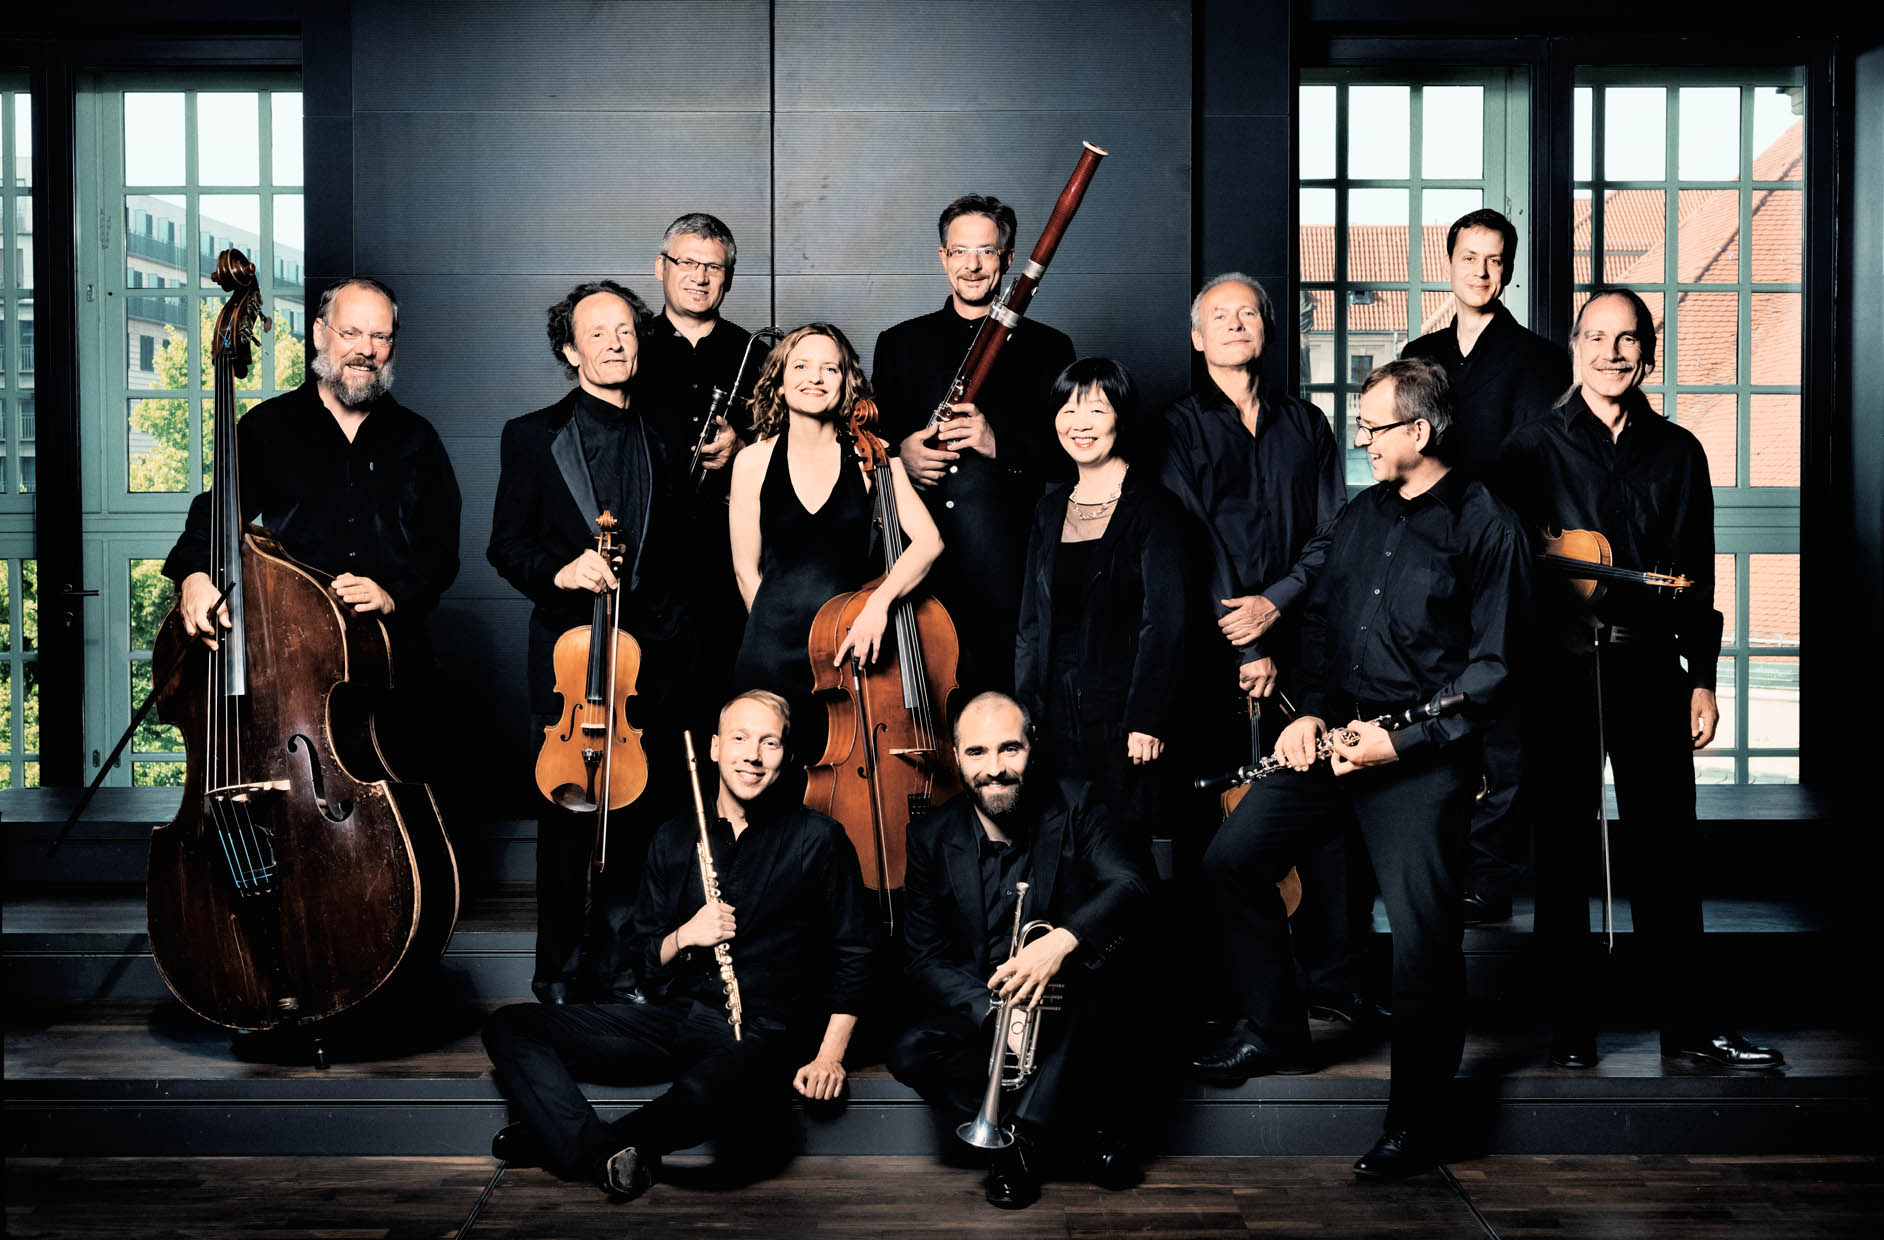 Ensemble unitedberlin